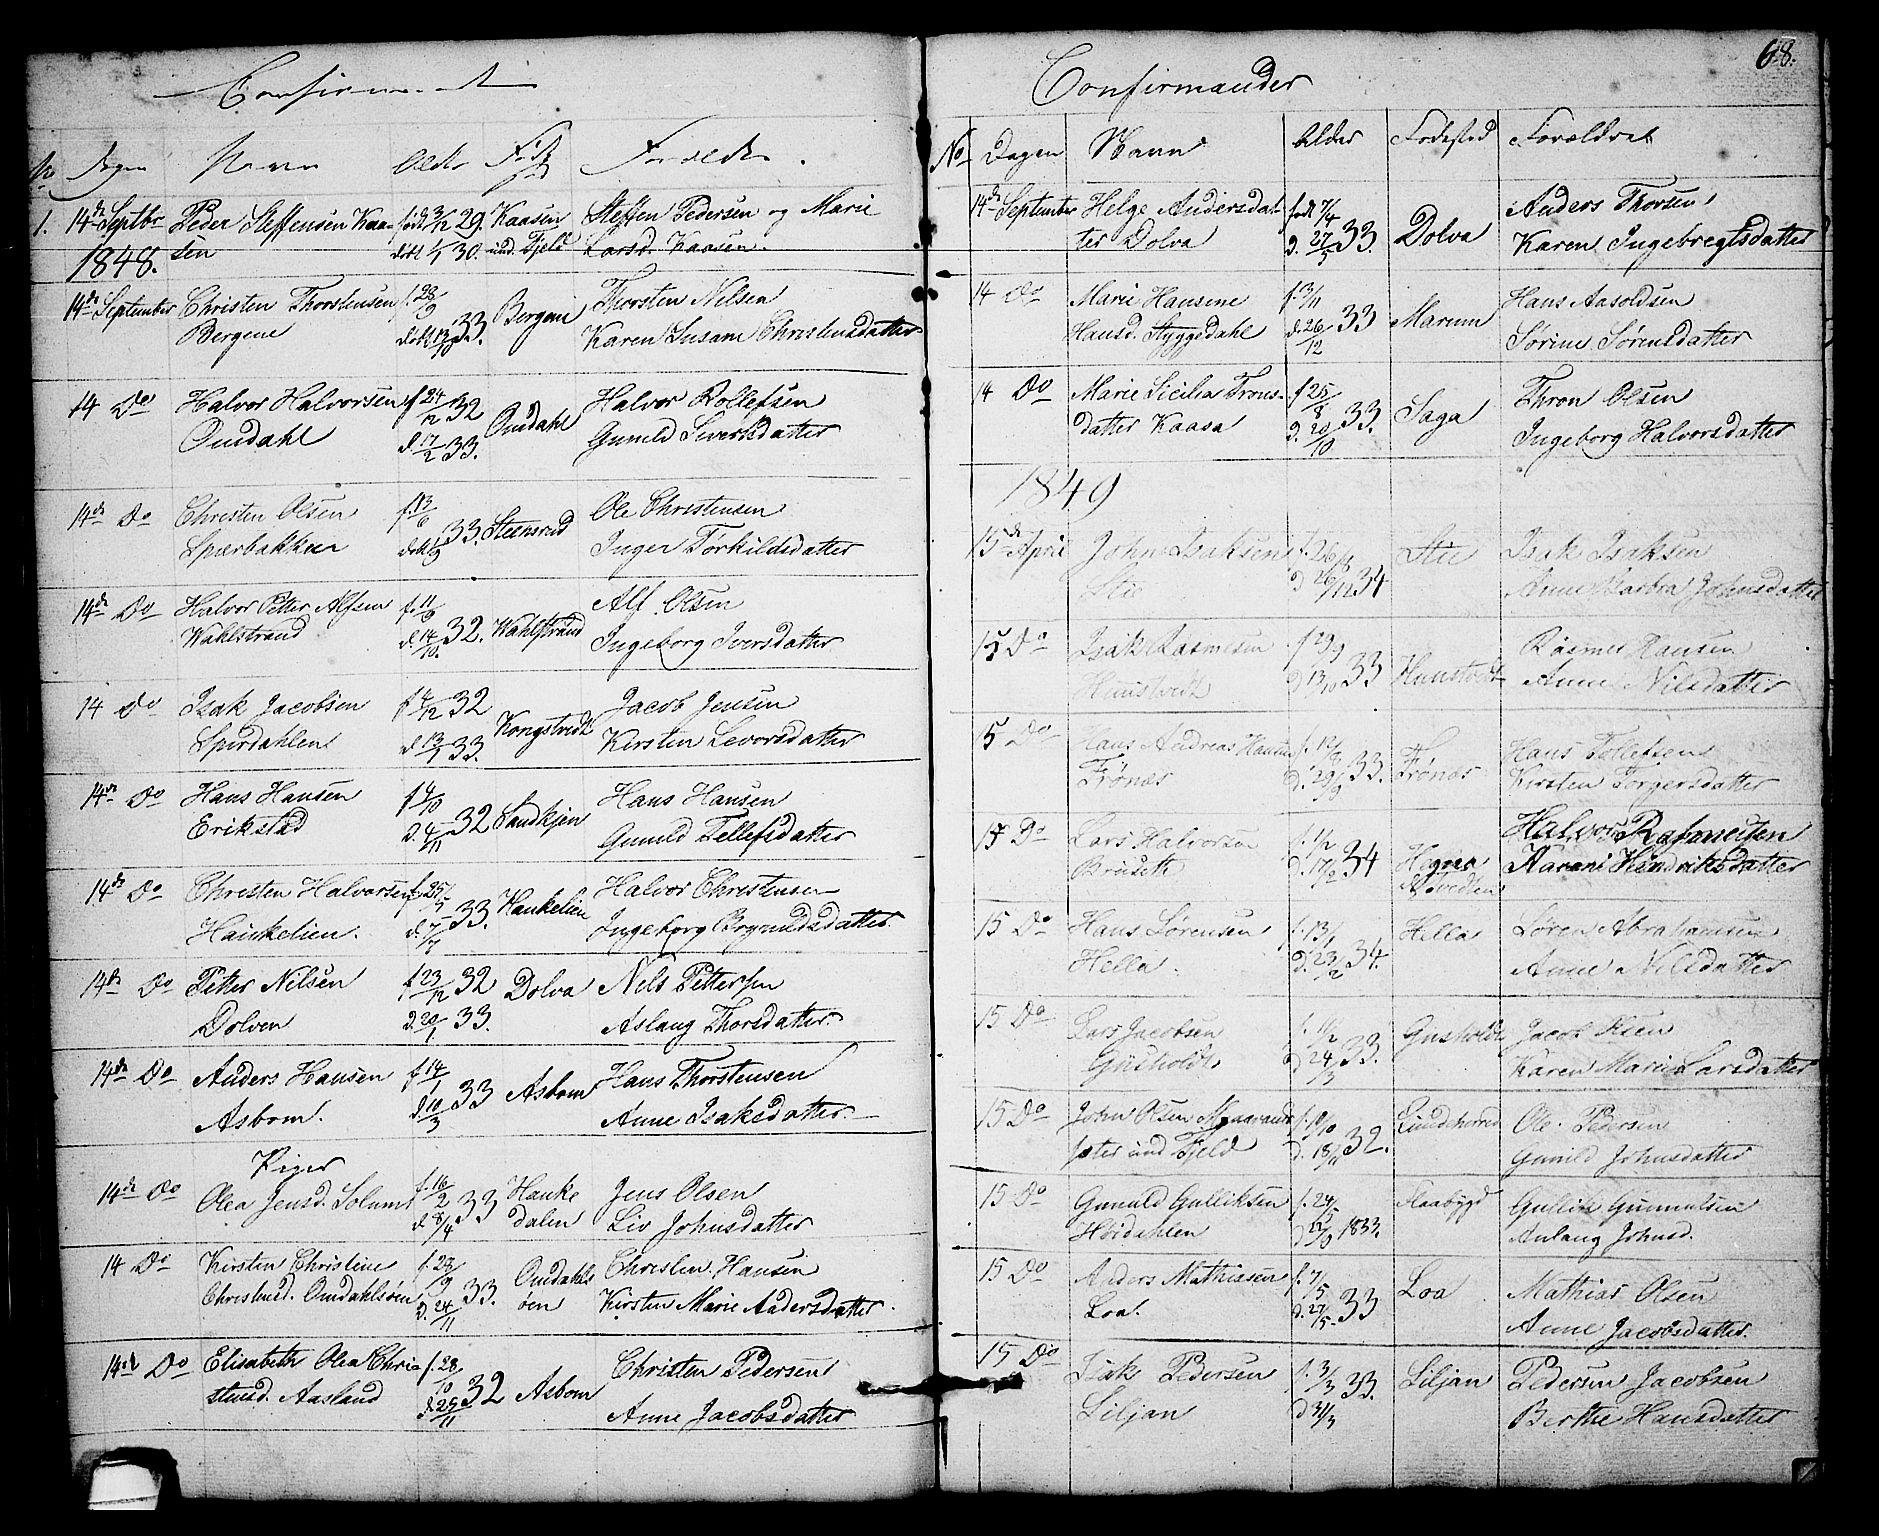 SAKO, Solum kirkebøker, G/Gb/L0001: Klokkerbok nr. II 1, 1848-1859, s. 68